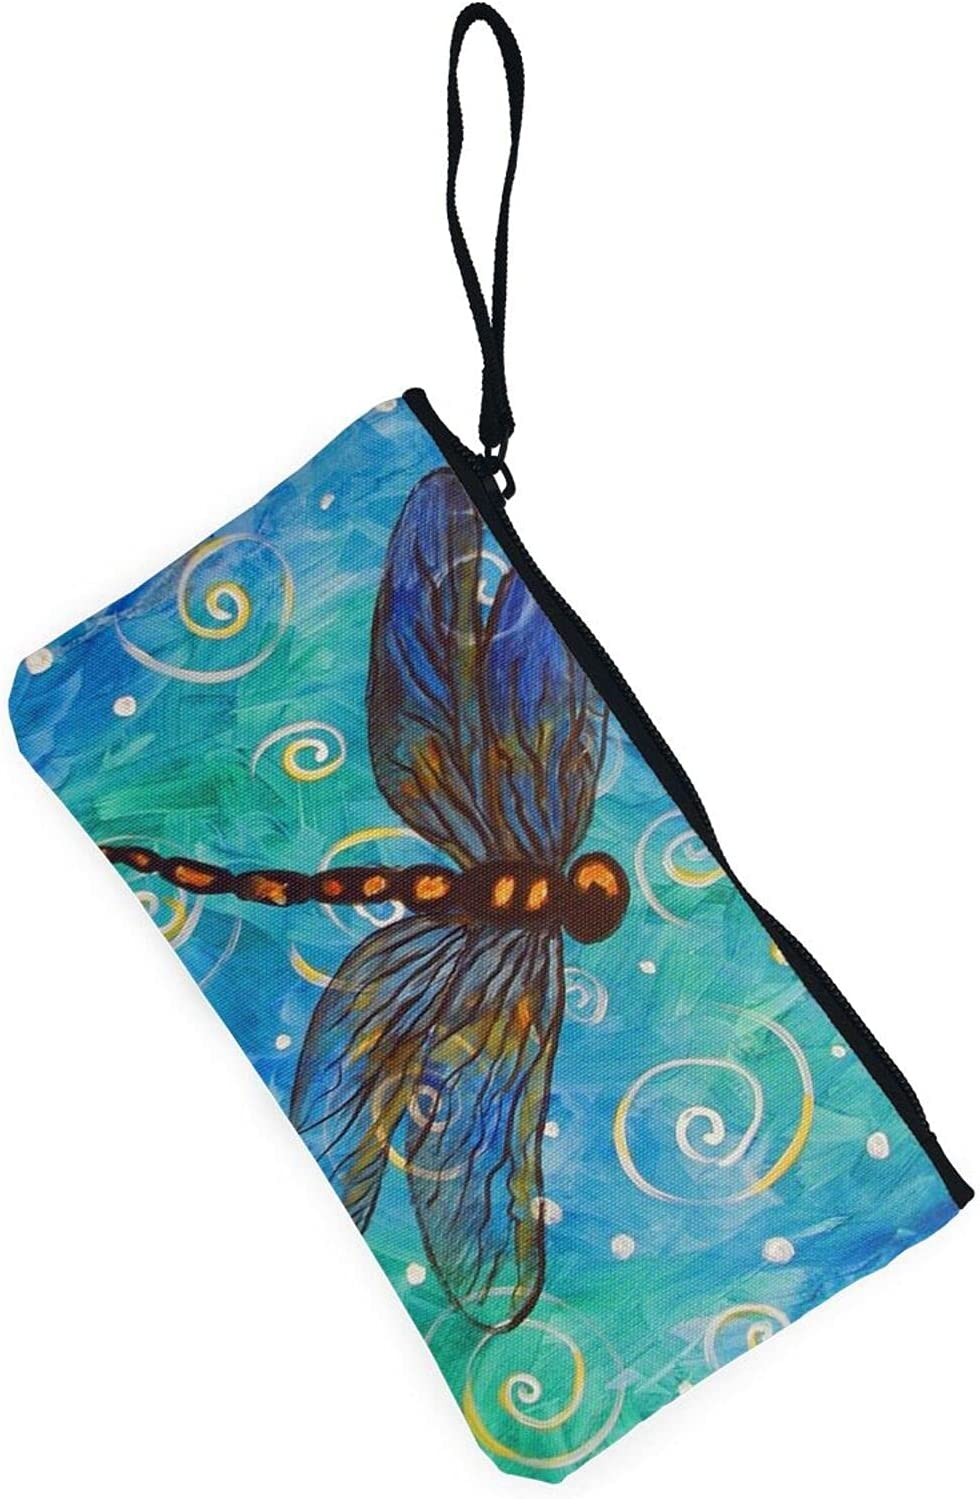 AORRUAM Blue dragonfly Canvas Coin Purse,Canvas Zipper Pencil Cases,Canvas Change Purse Pouch Mini Wallet Coin Bag